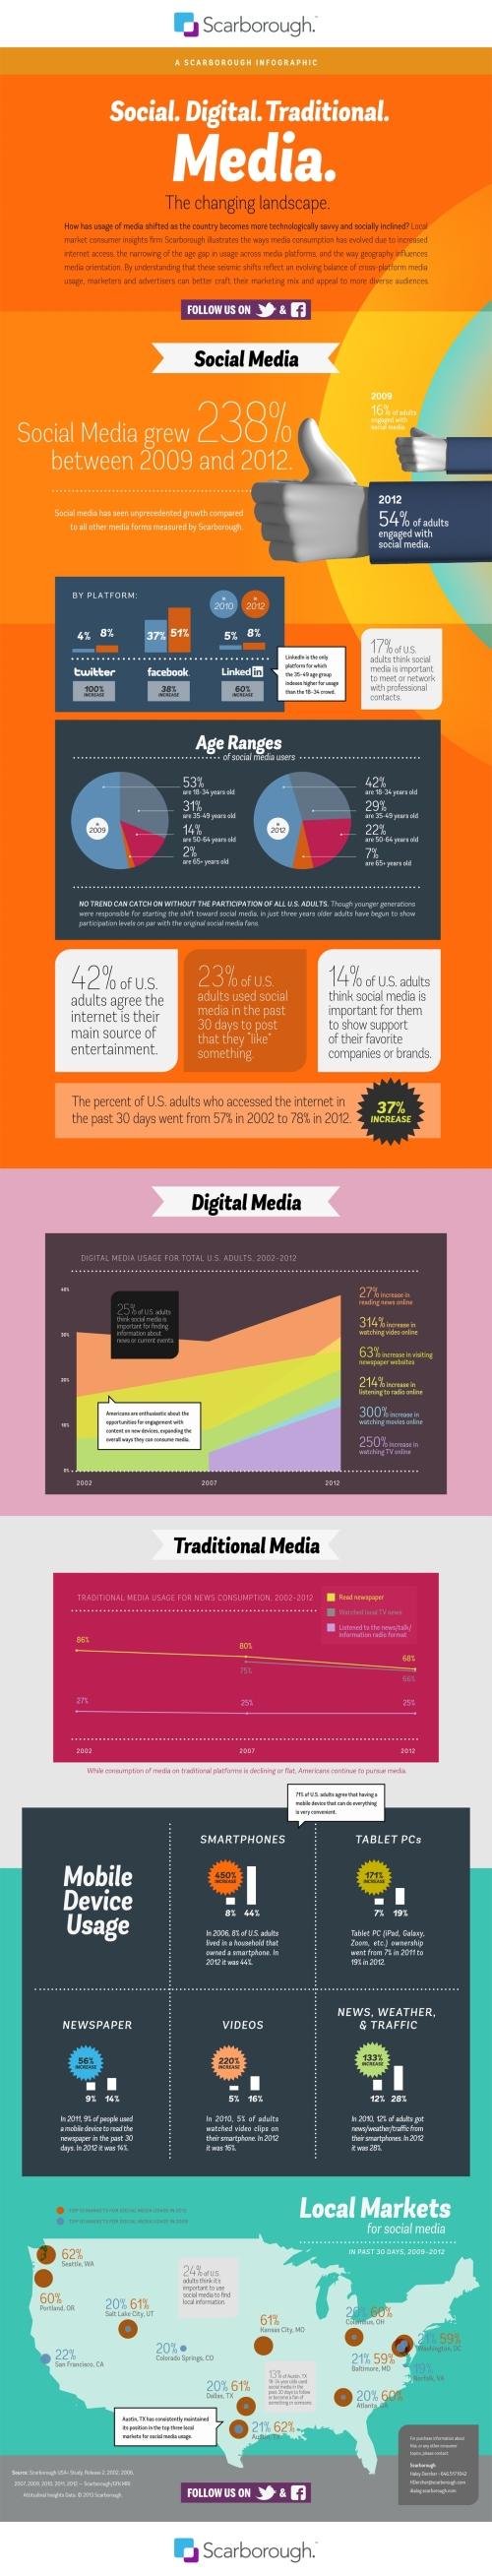 The changing social media landscape.